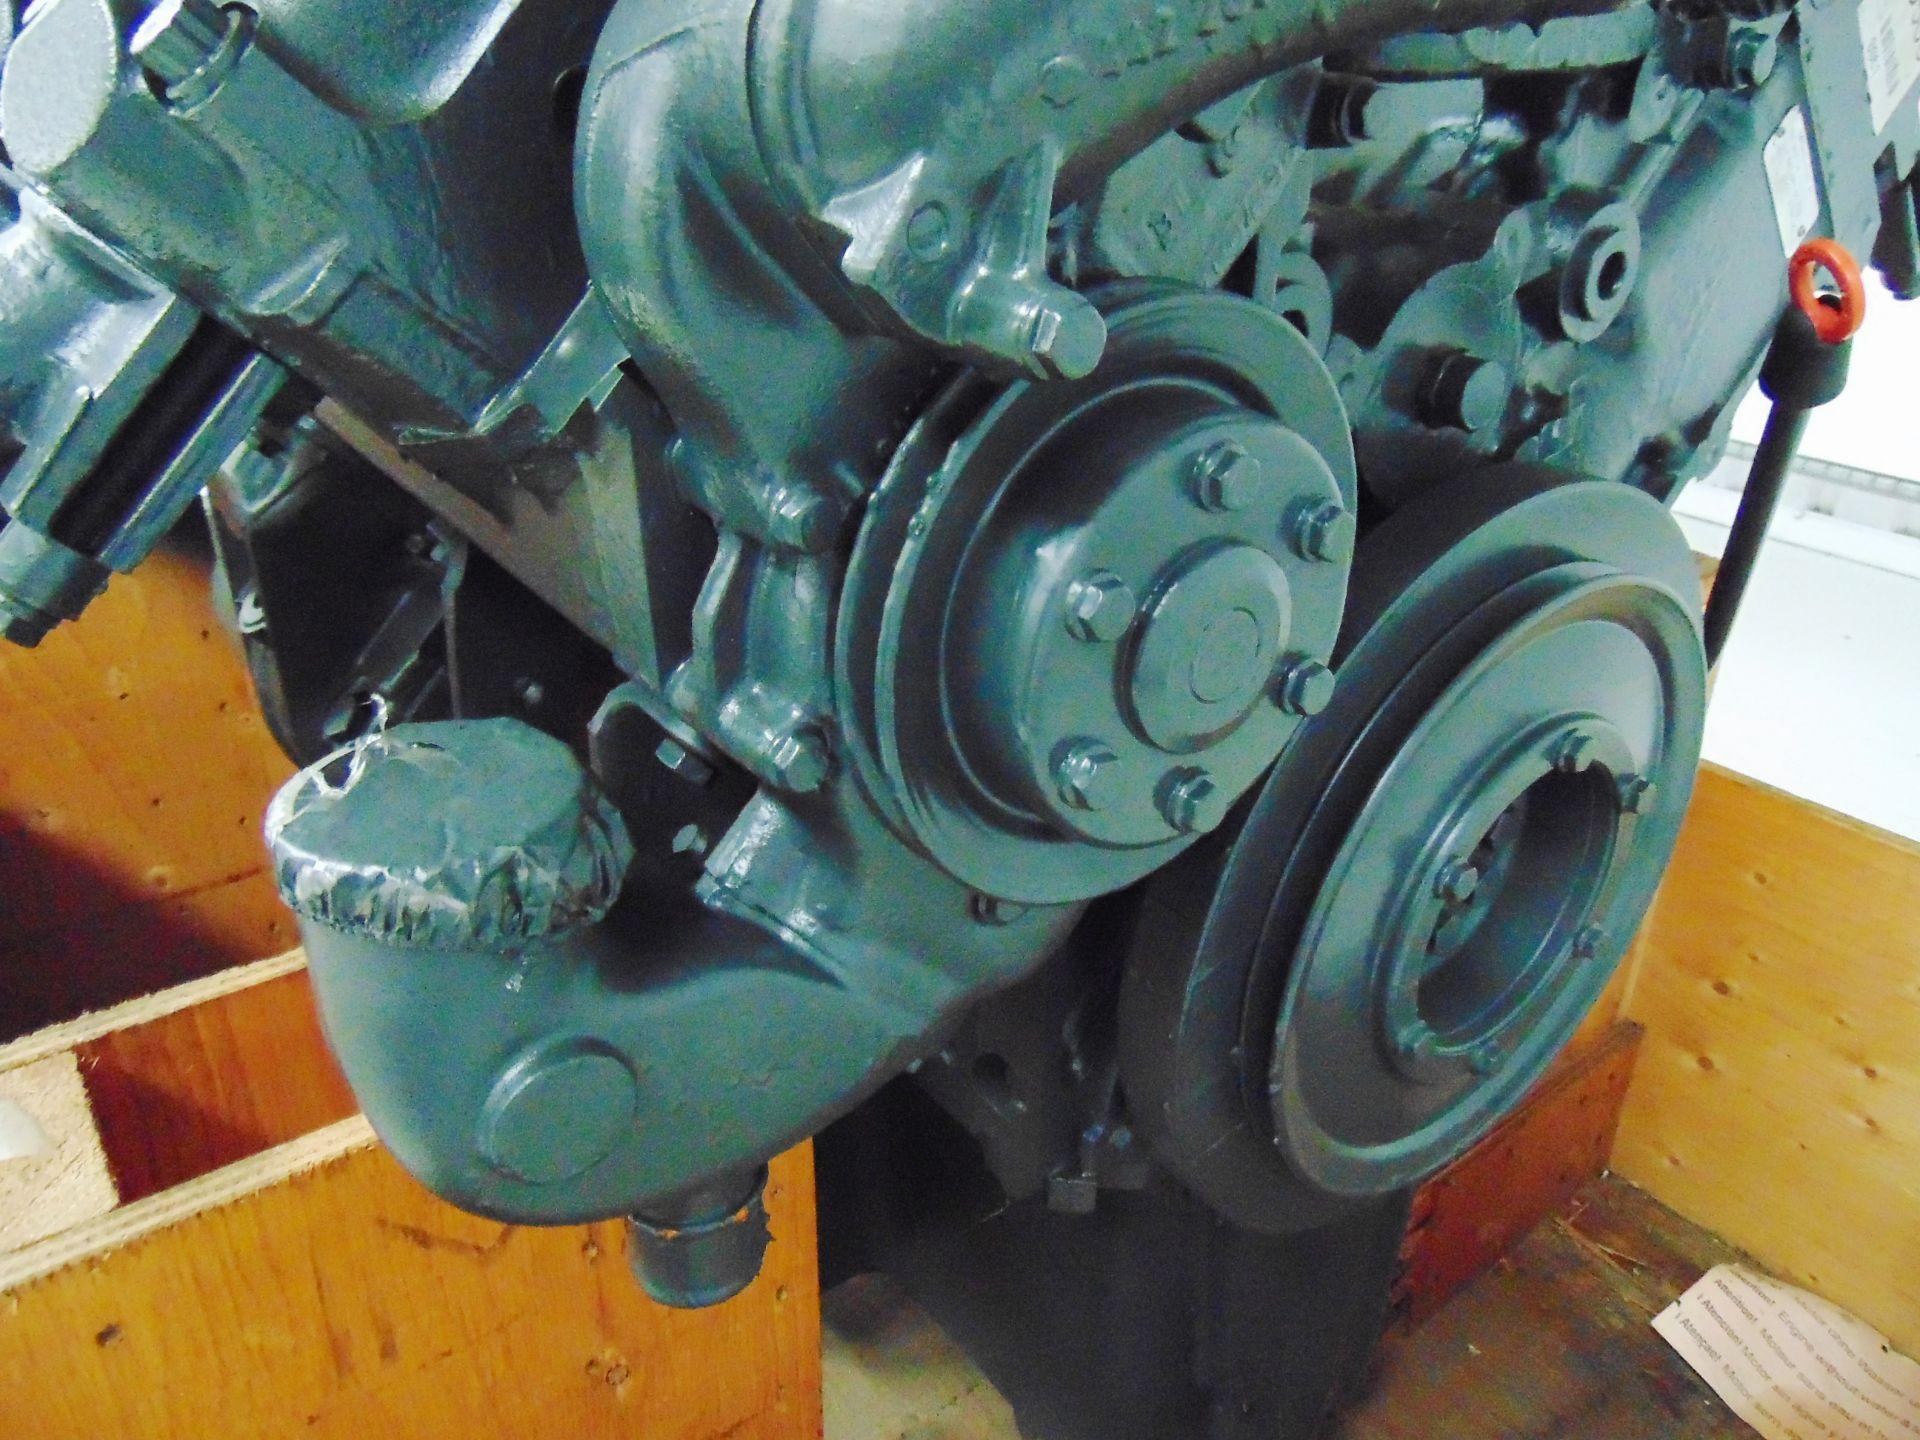 Lot 5 - Brand New & Unused Mercedes-Benz OM442LA V8 Twin Turbo Diesel Engine